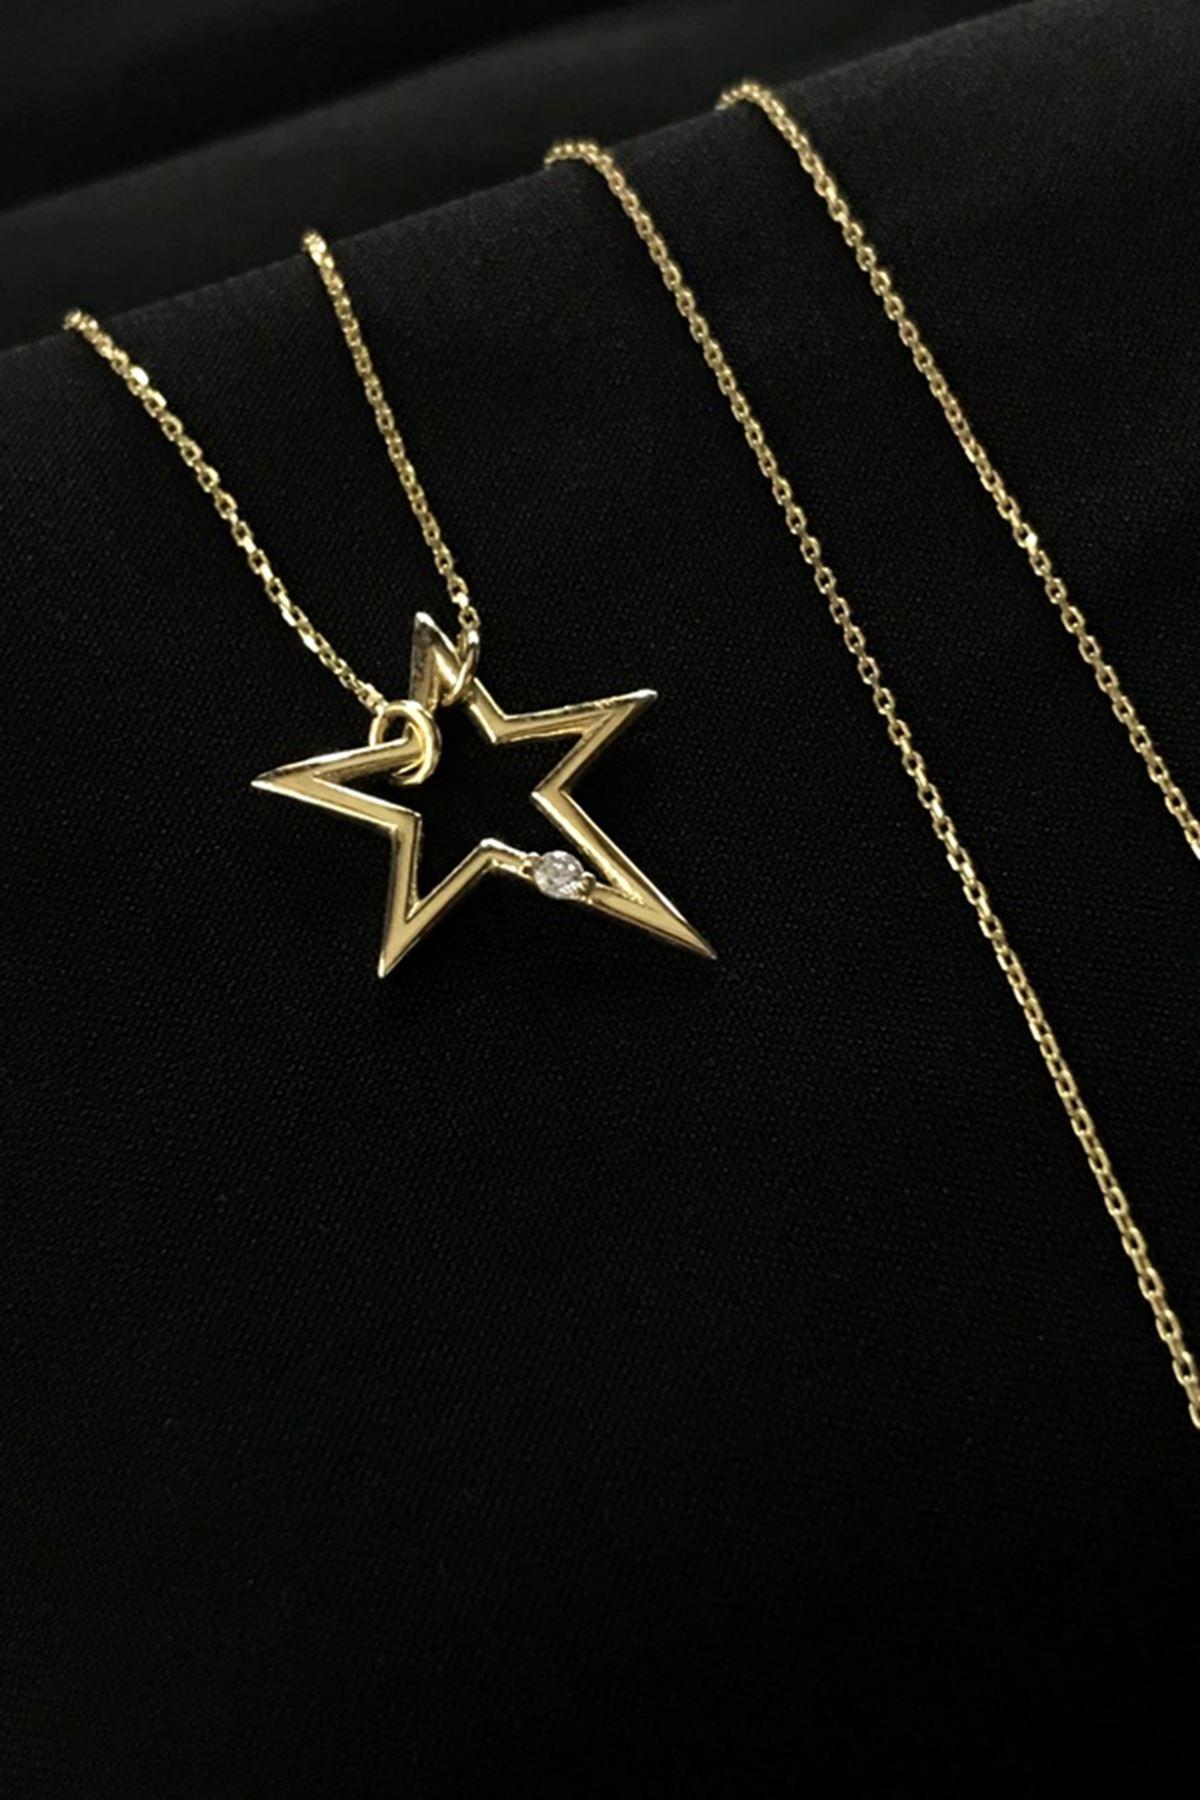 Taş Detaylı Yıldız Kolye 8A0016